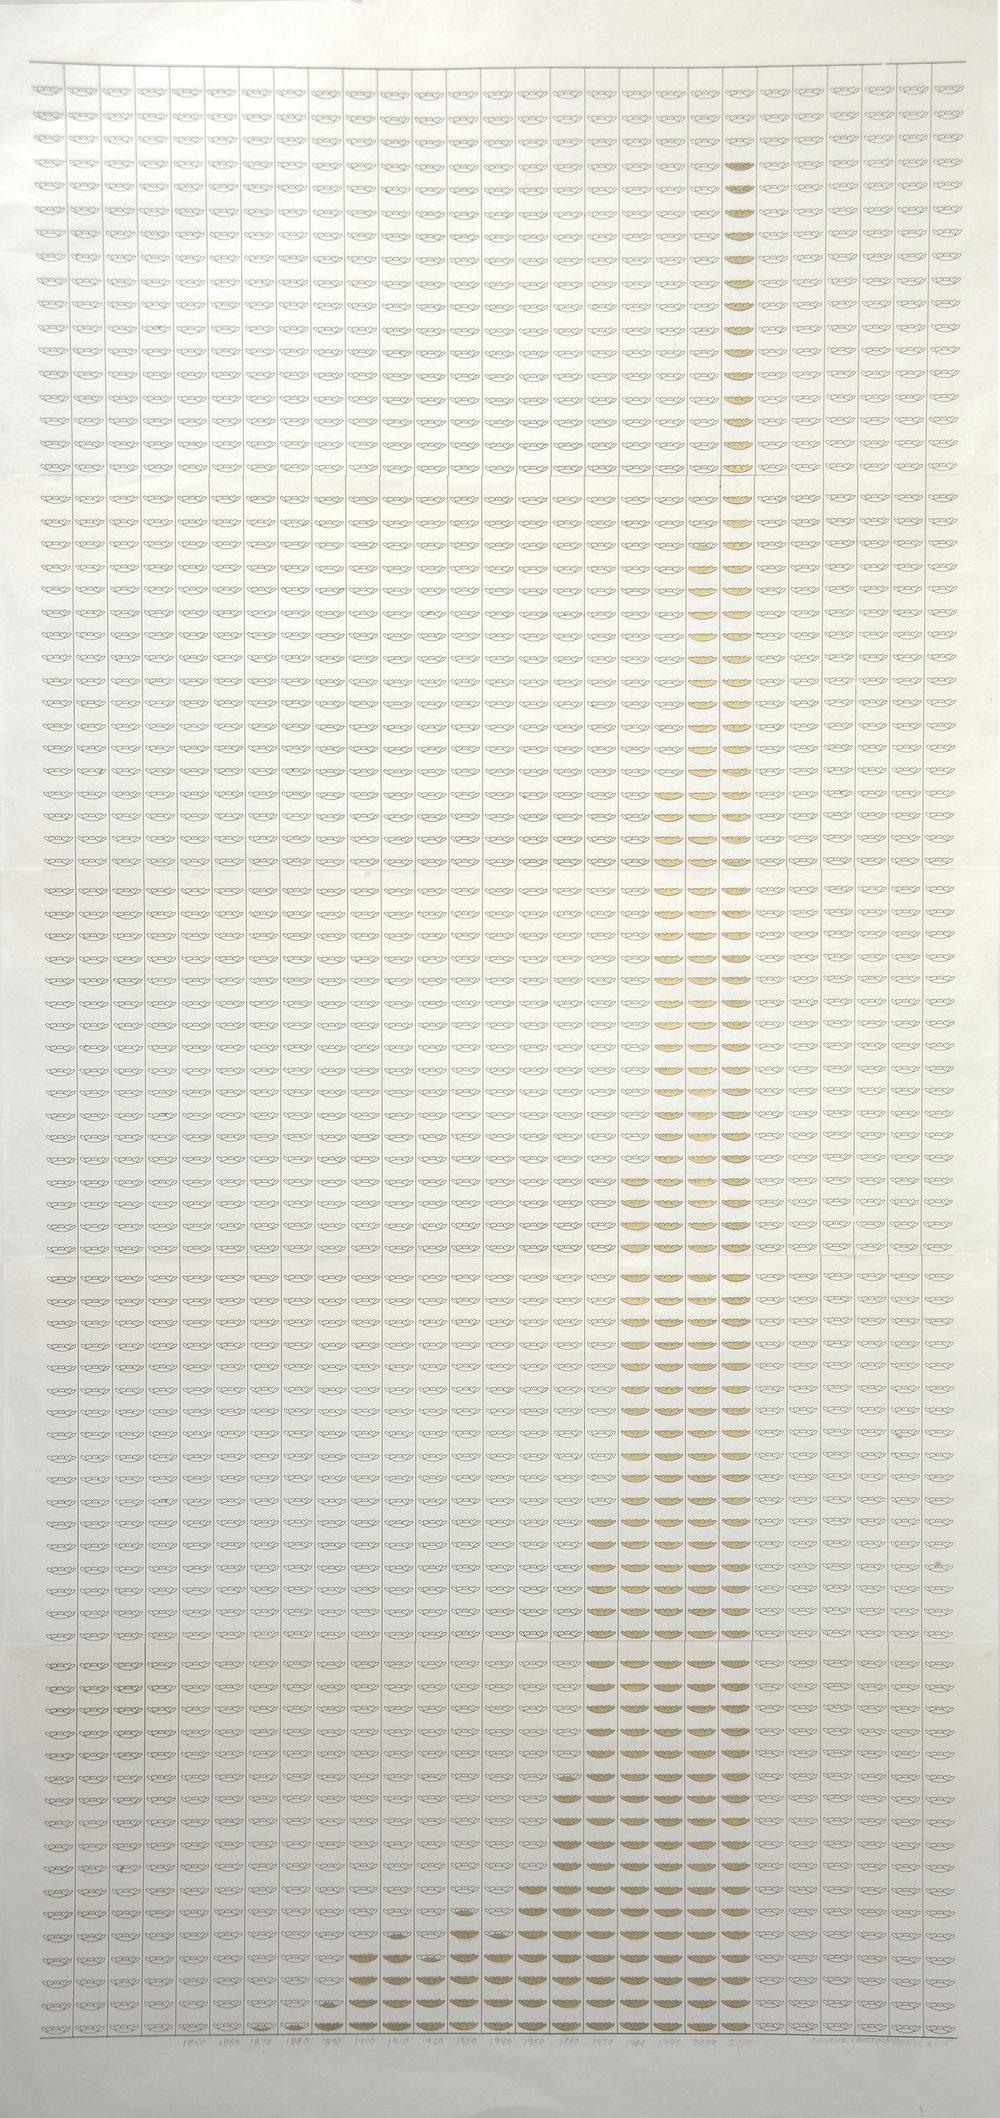 Gold Mountain Prayer (Boston Census)